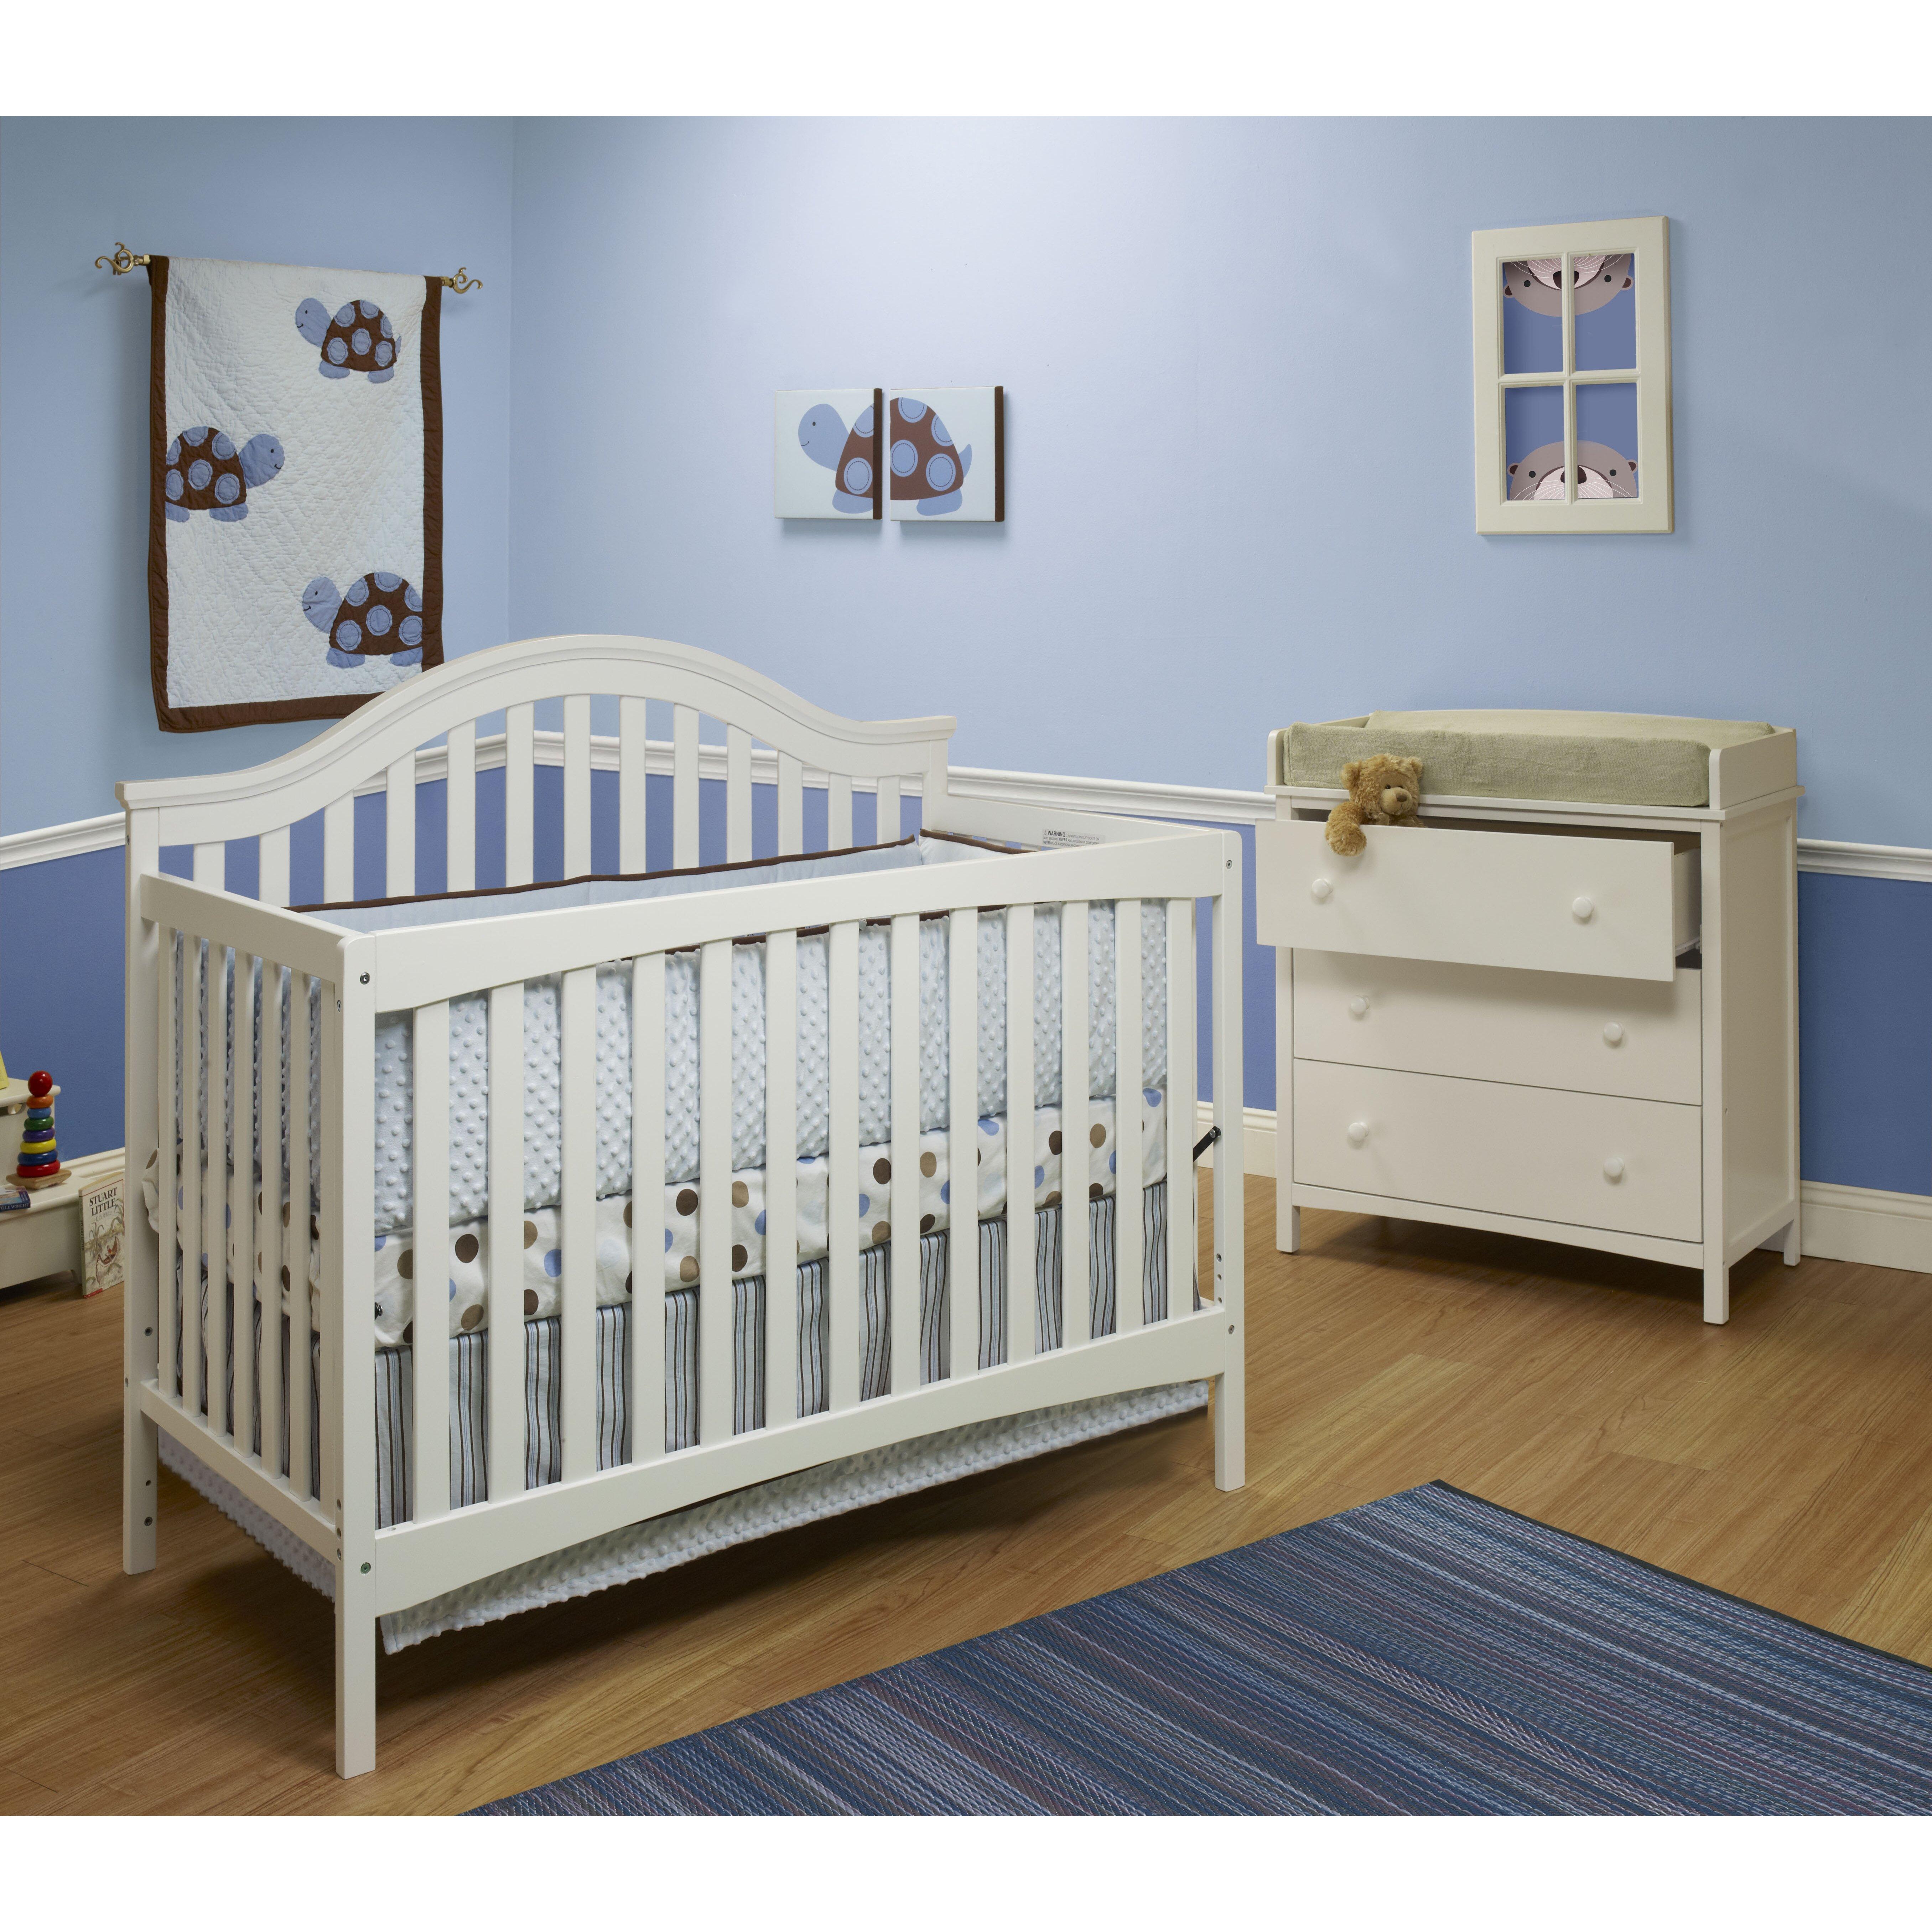 Baby crib mattress frame - Sorelle Lynn 4in1 Convertible Crib